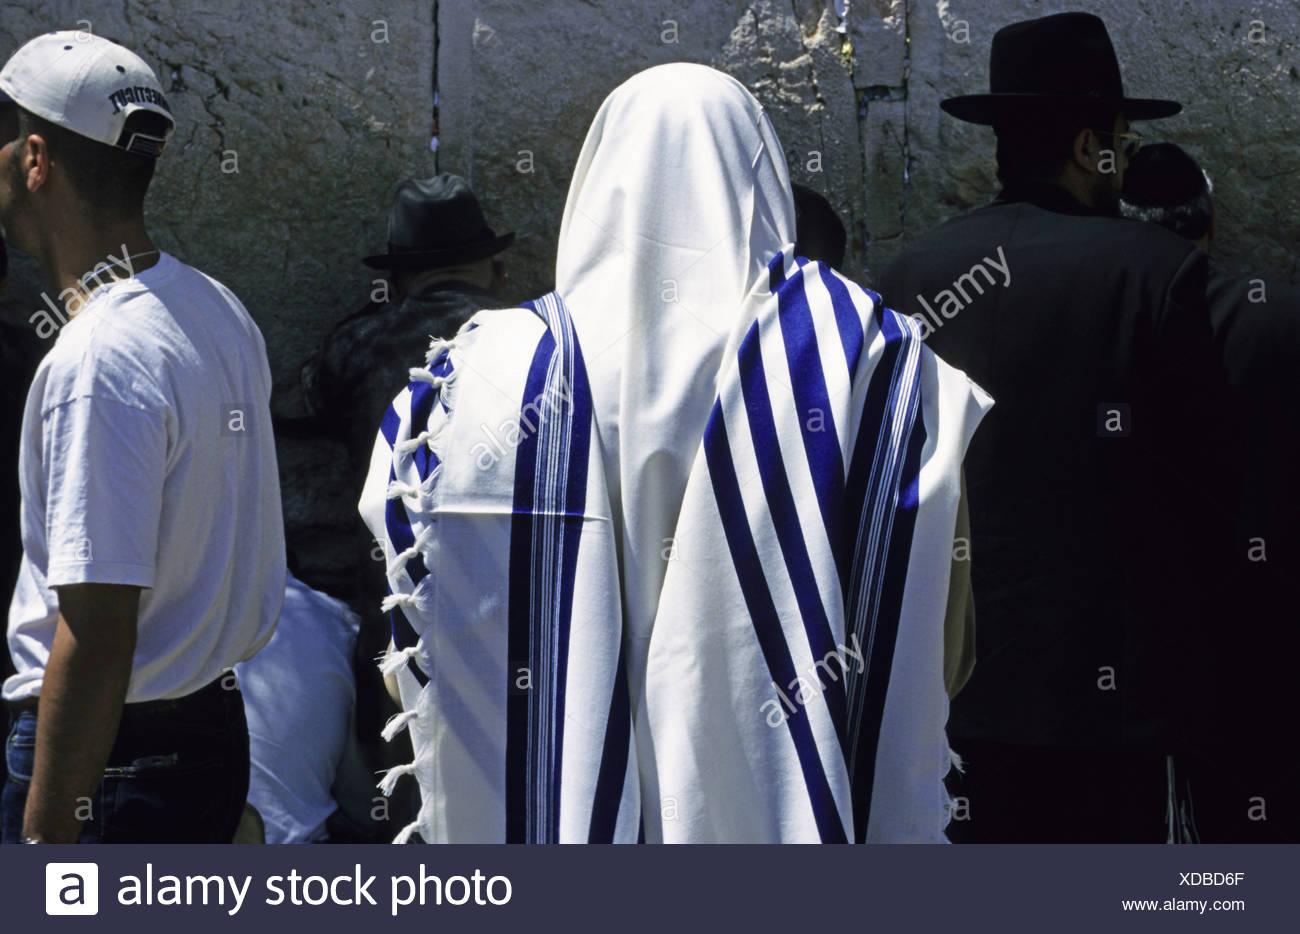 Jew wearing tallis, tallit, Wailing Wall, Jerusalem, Israel - Stock Image